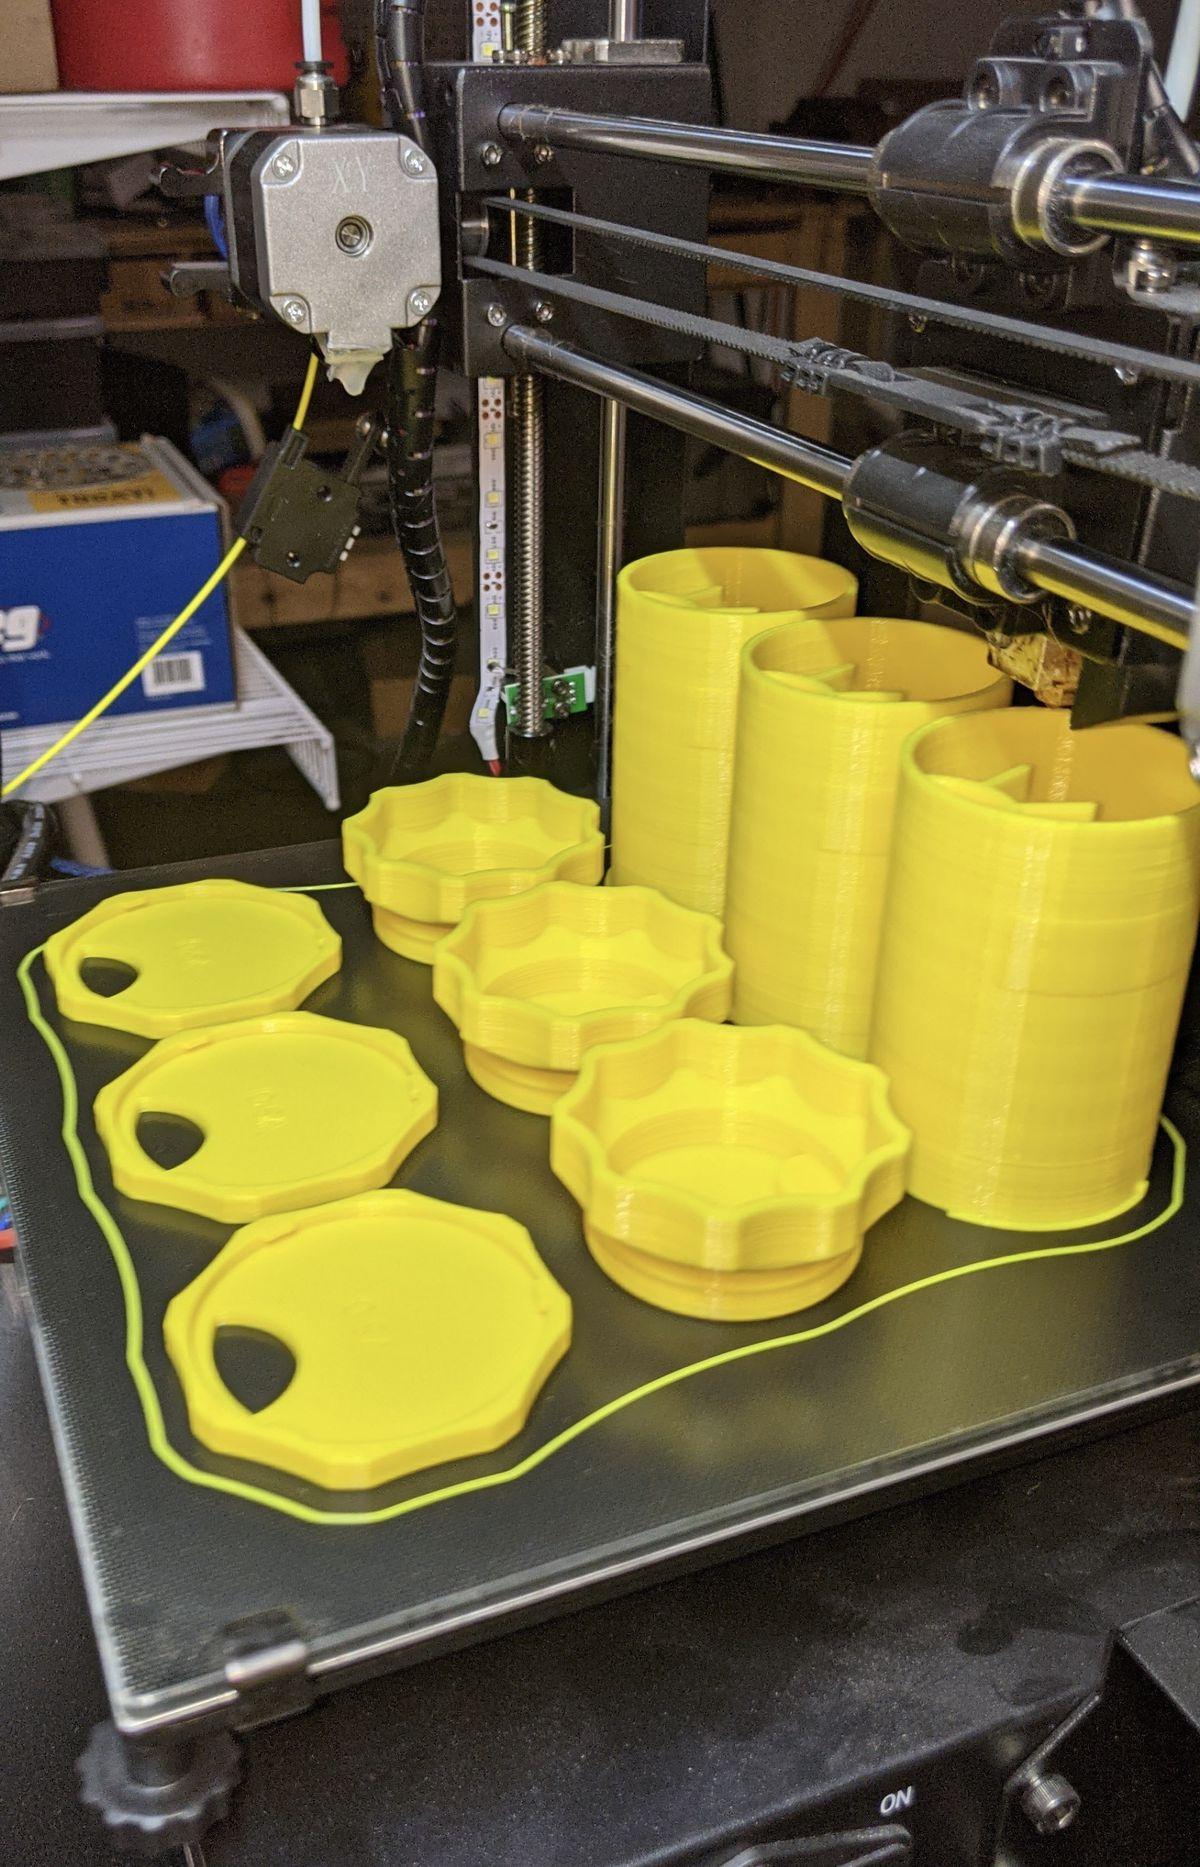 Three yellow bottles, three hats, and three bases sitting on a 3D printer.